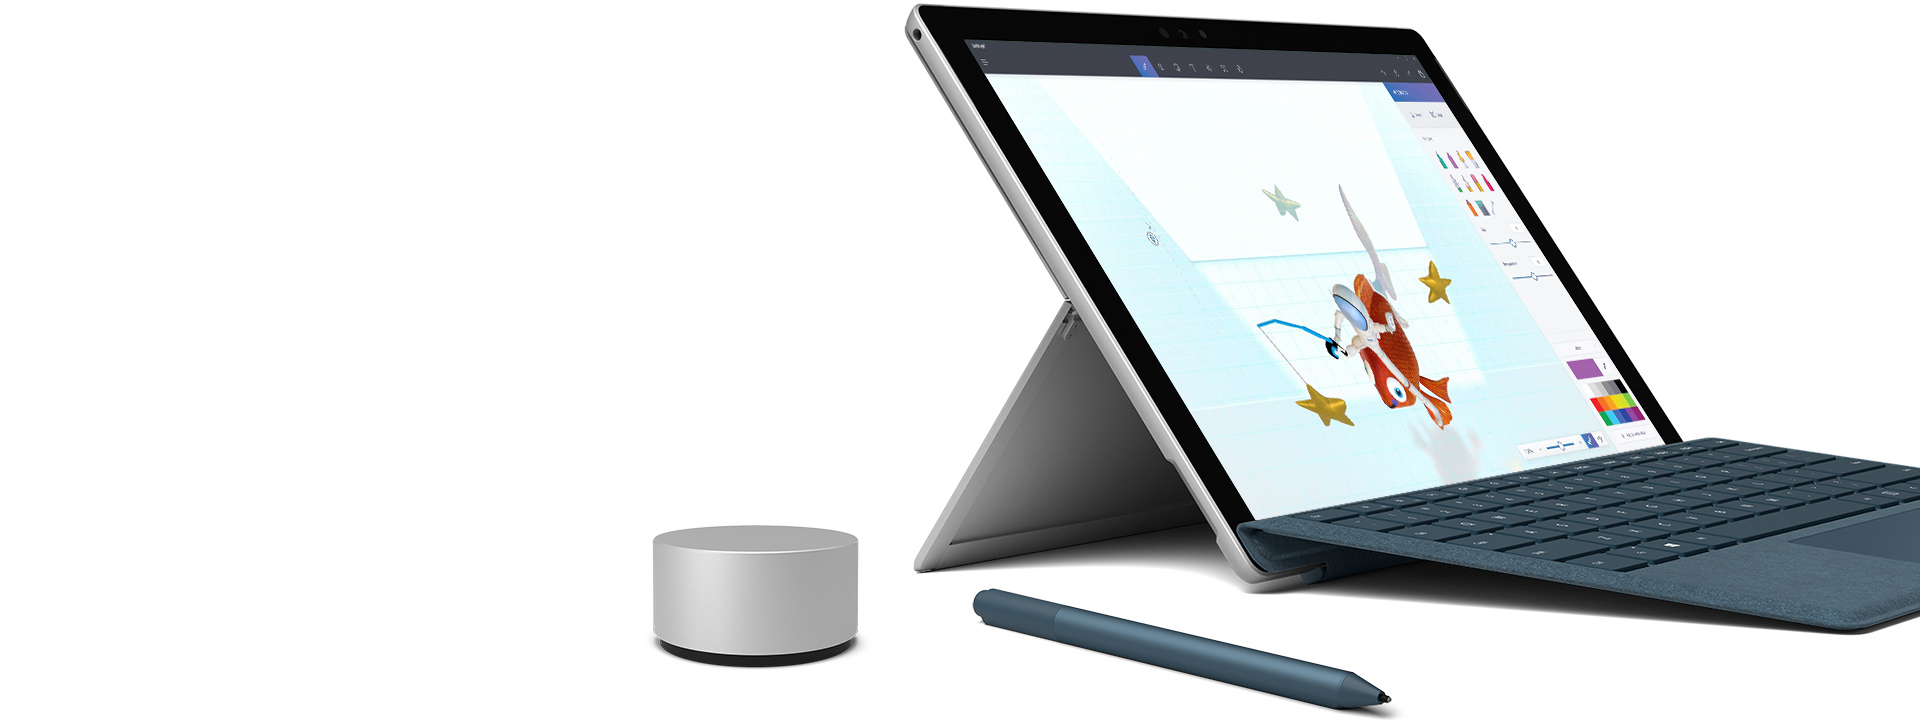 SurfacePro en mode ordinateur avec SurfaceDial, StyletSurface et clavier TypeCover.